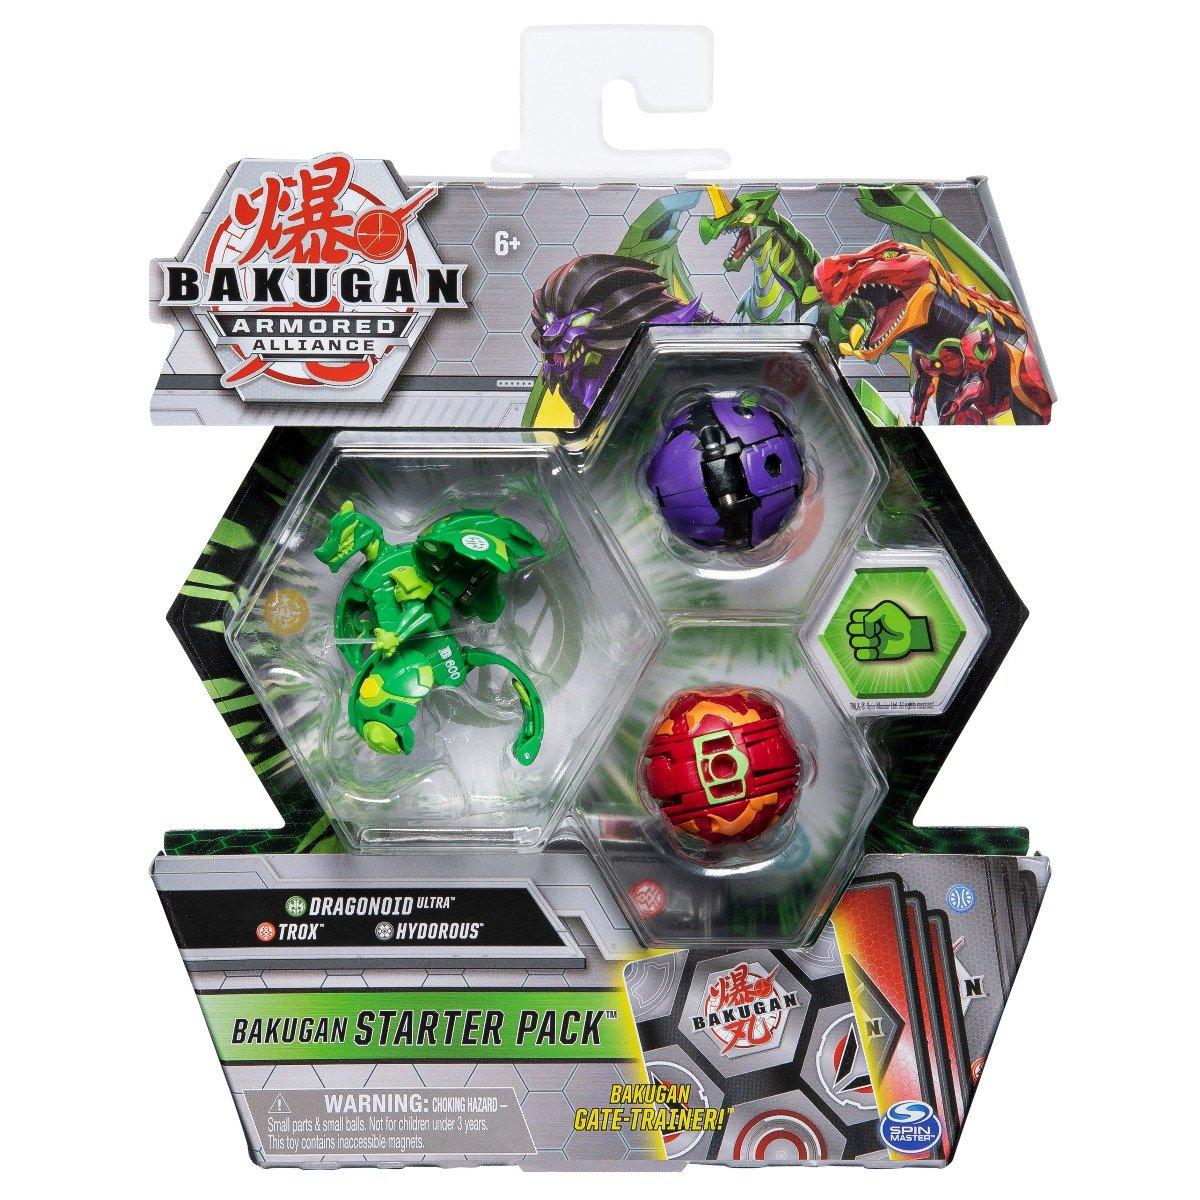 Set Bakugan Armored Alliance, Dragonoid Ultra, Trox, Hydorous 20122474